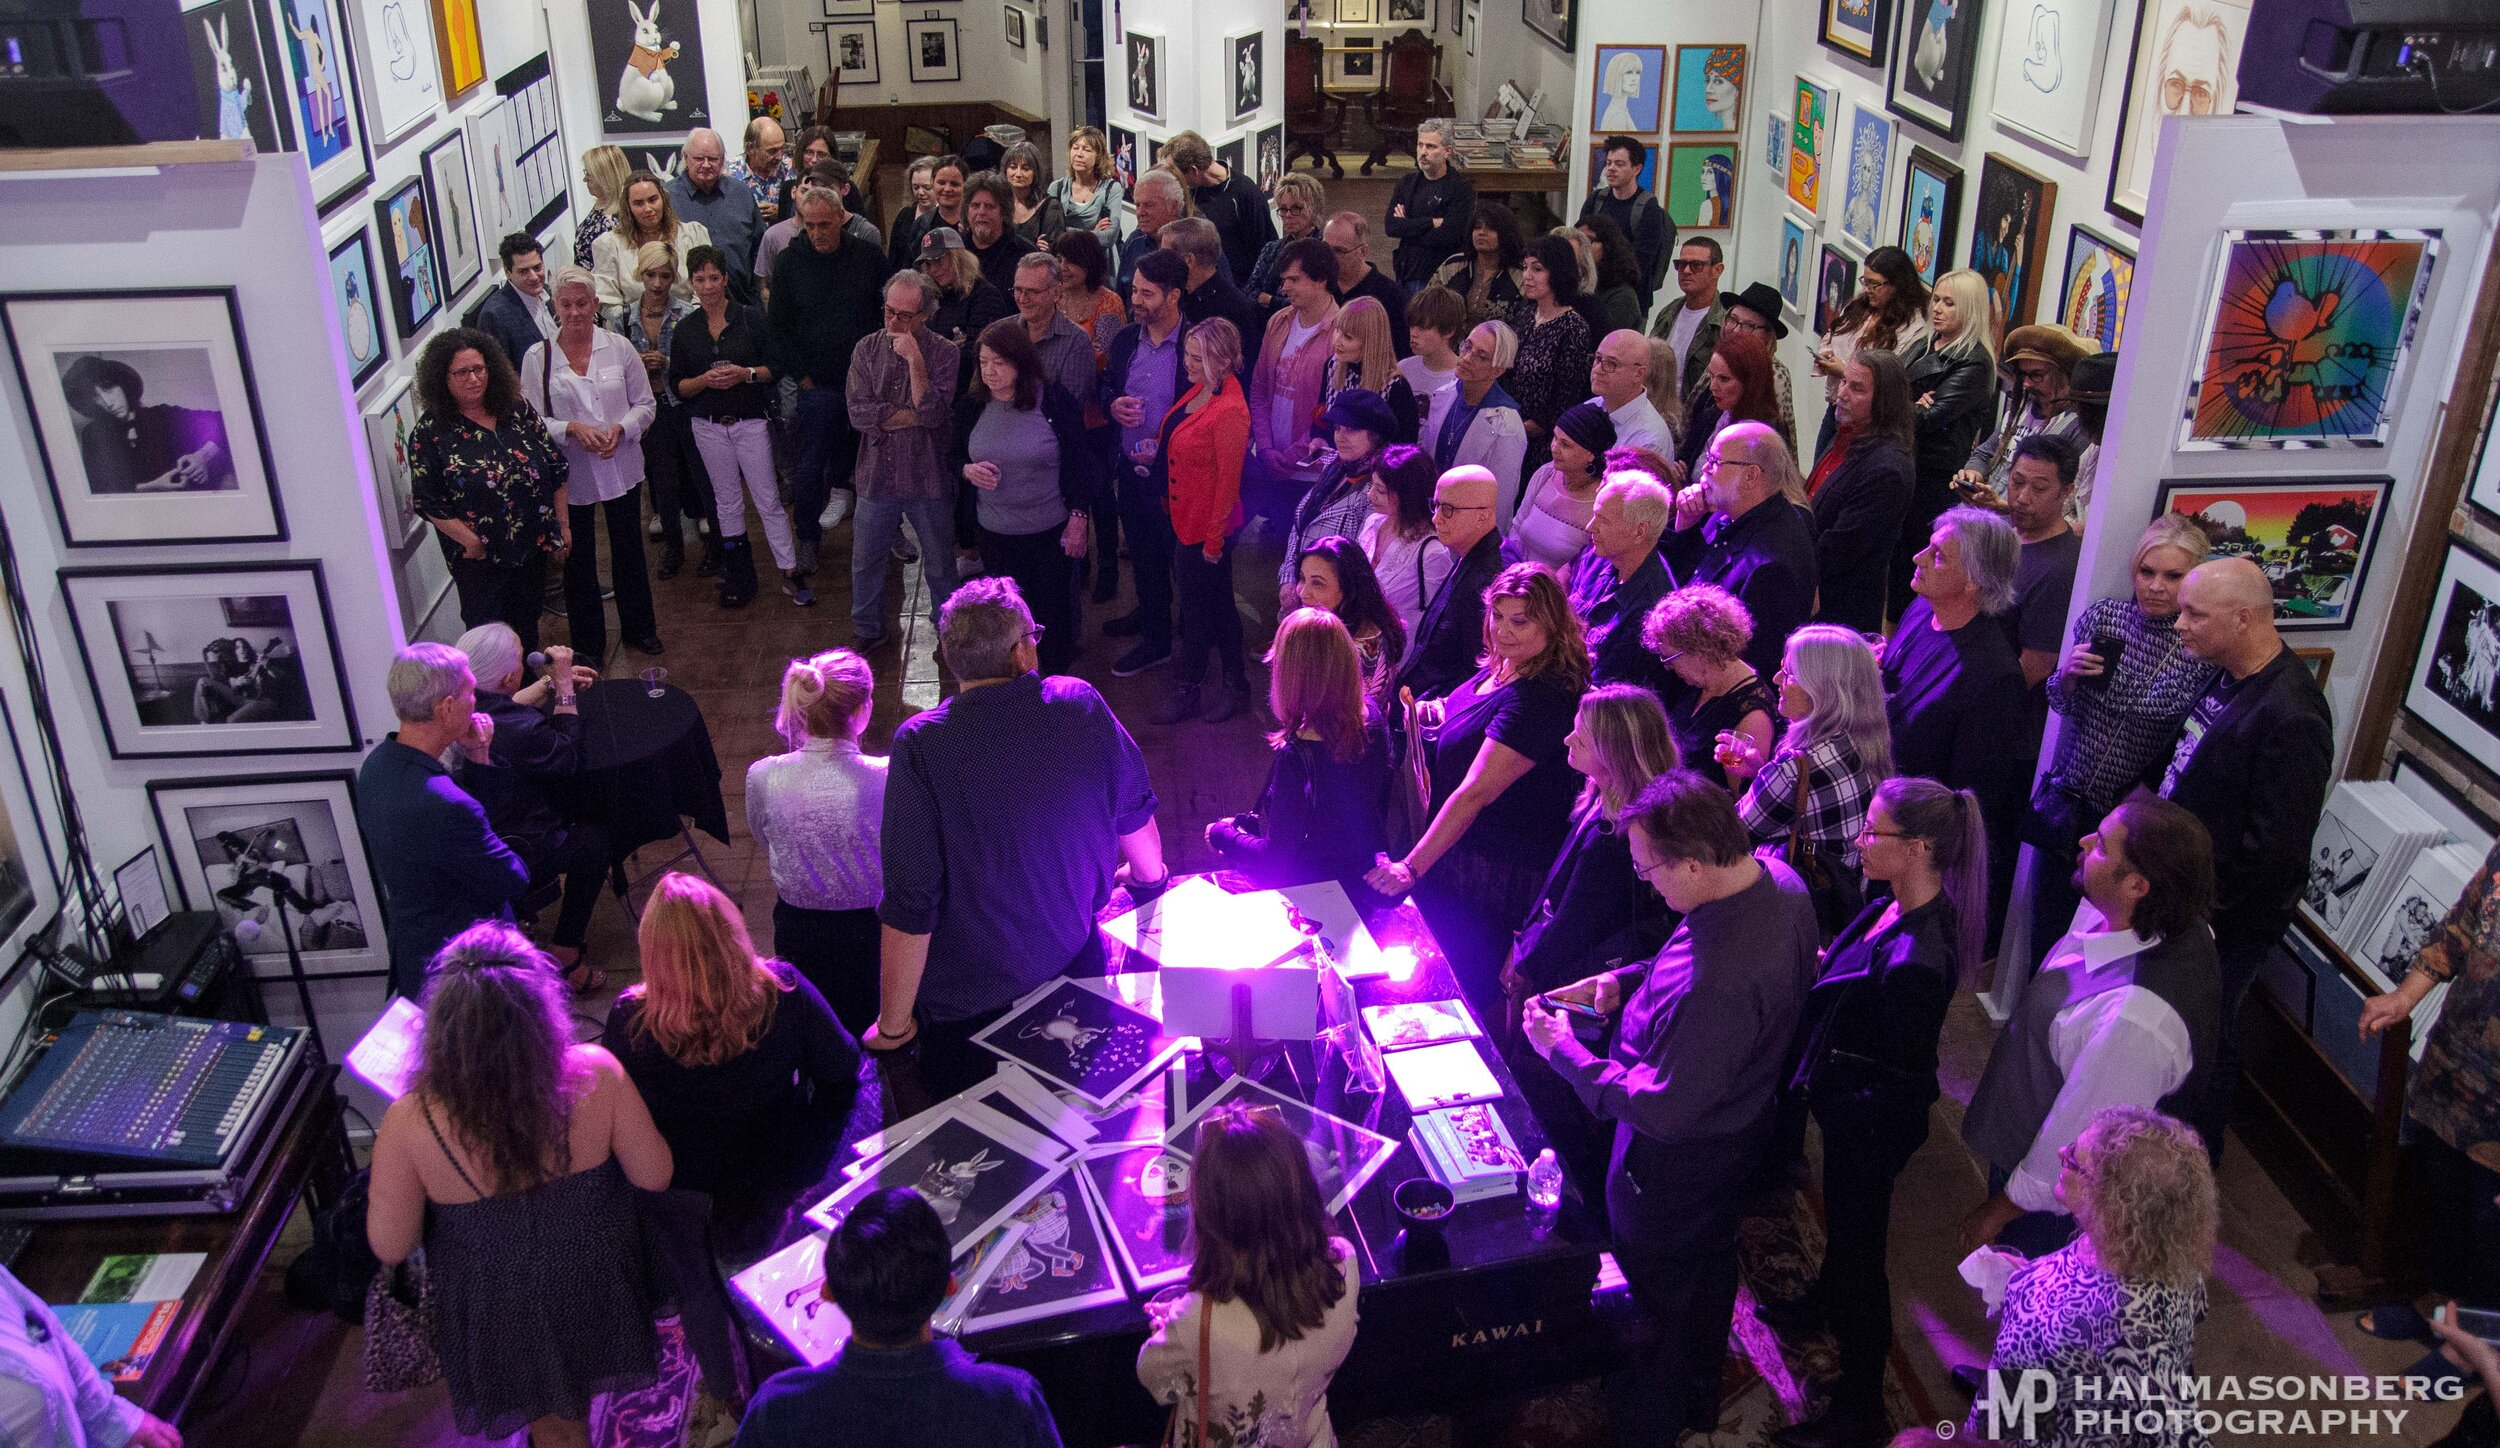 Grace Slick - Original Art Exhibition at Mr. Musichead Art Gallery